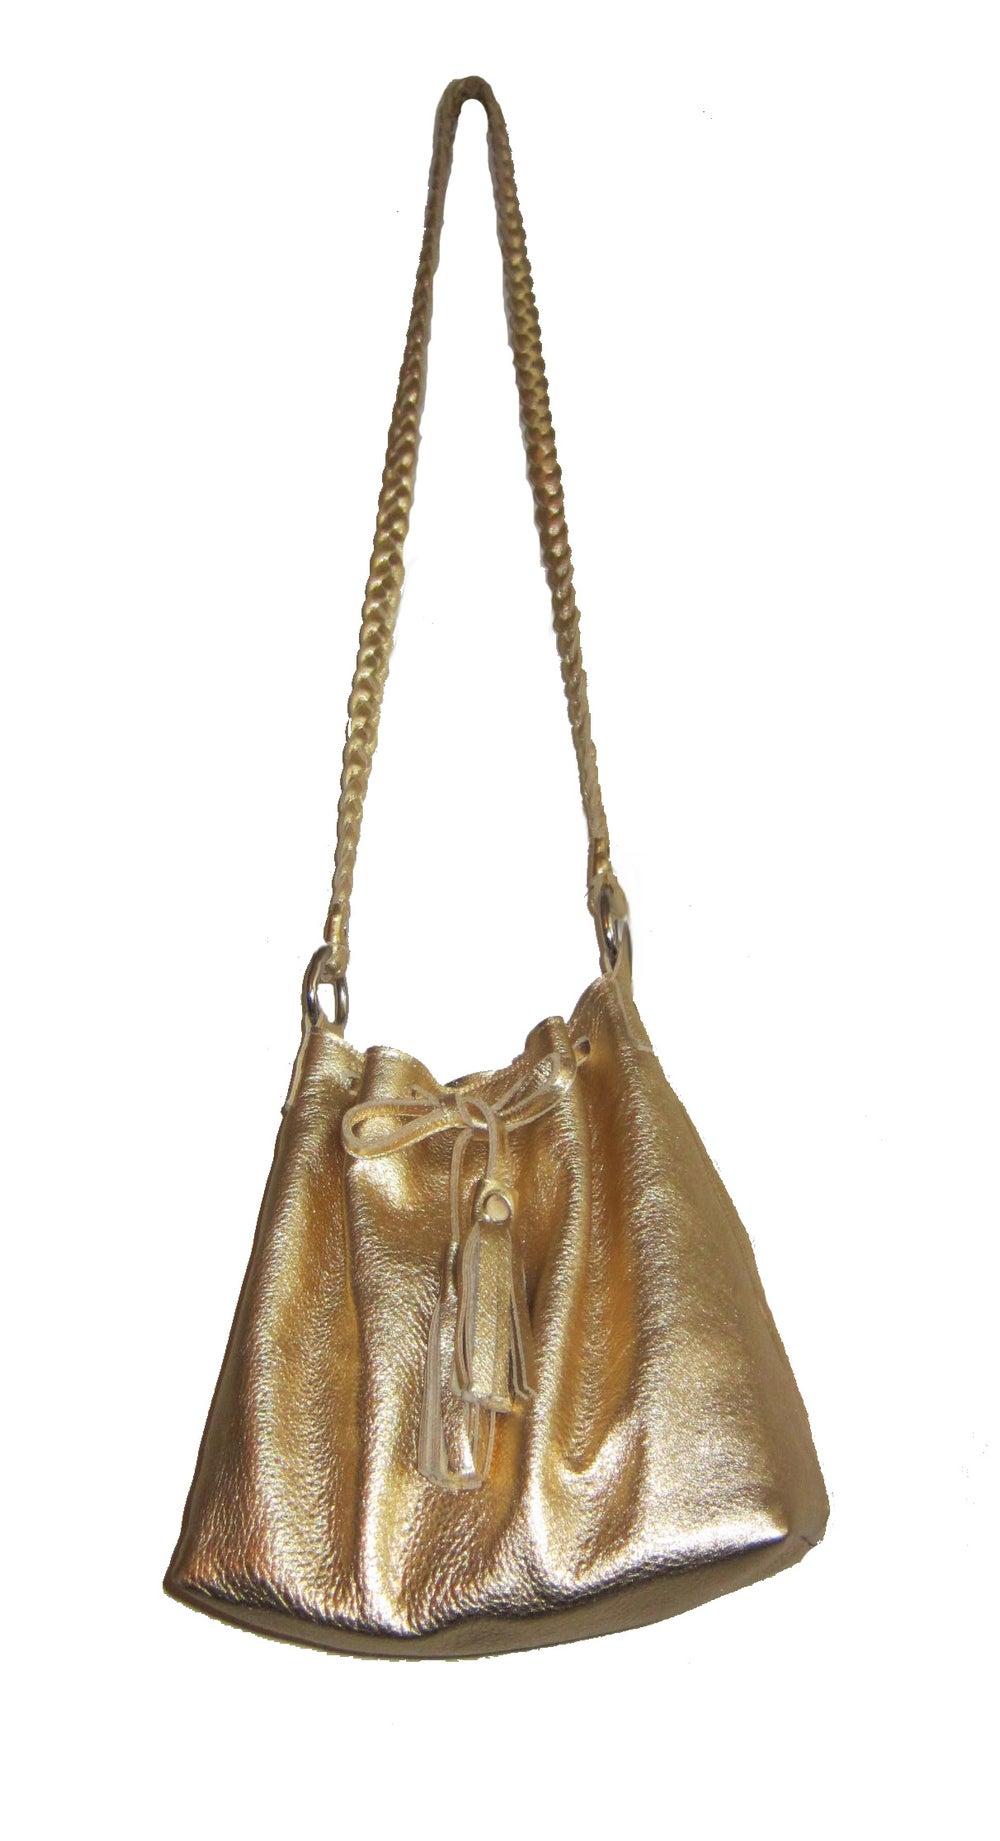 Image of Wildflower Cross-body Bucket Bag ~LG~